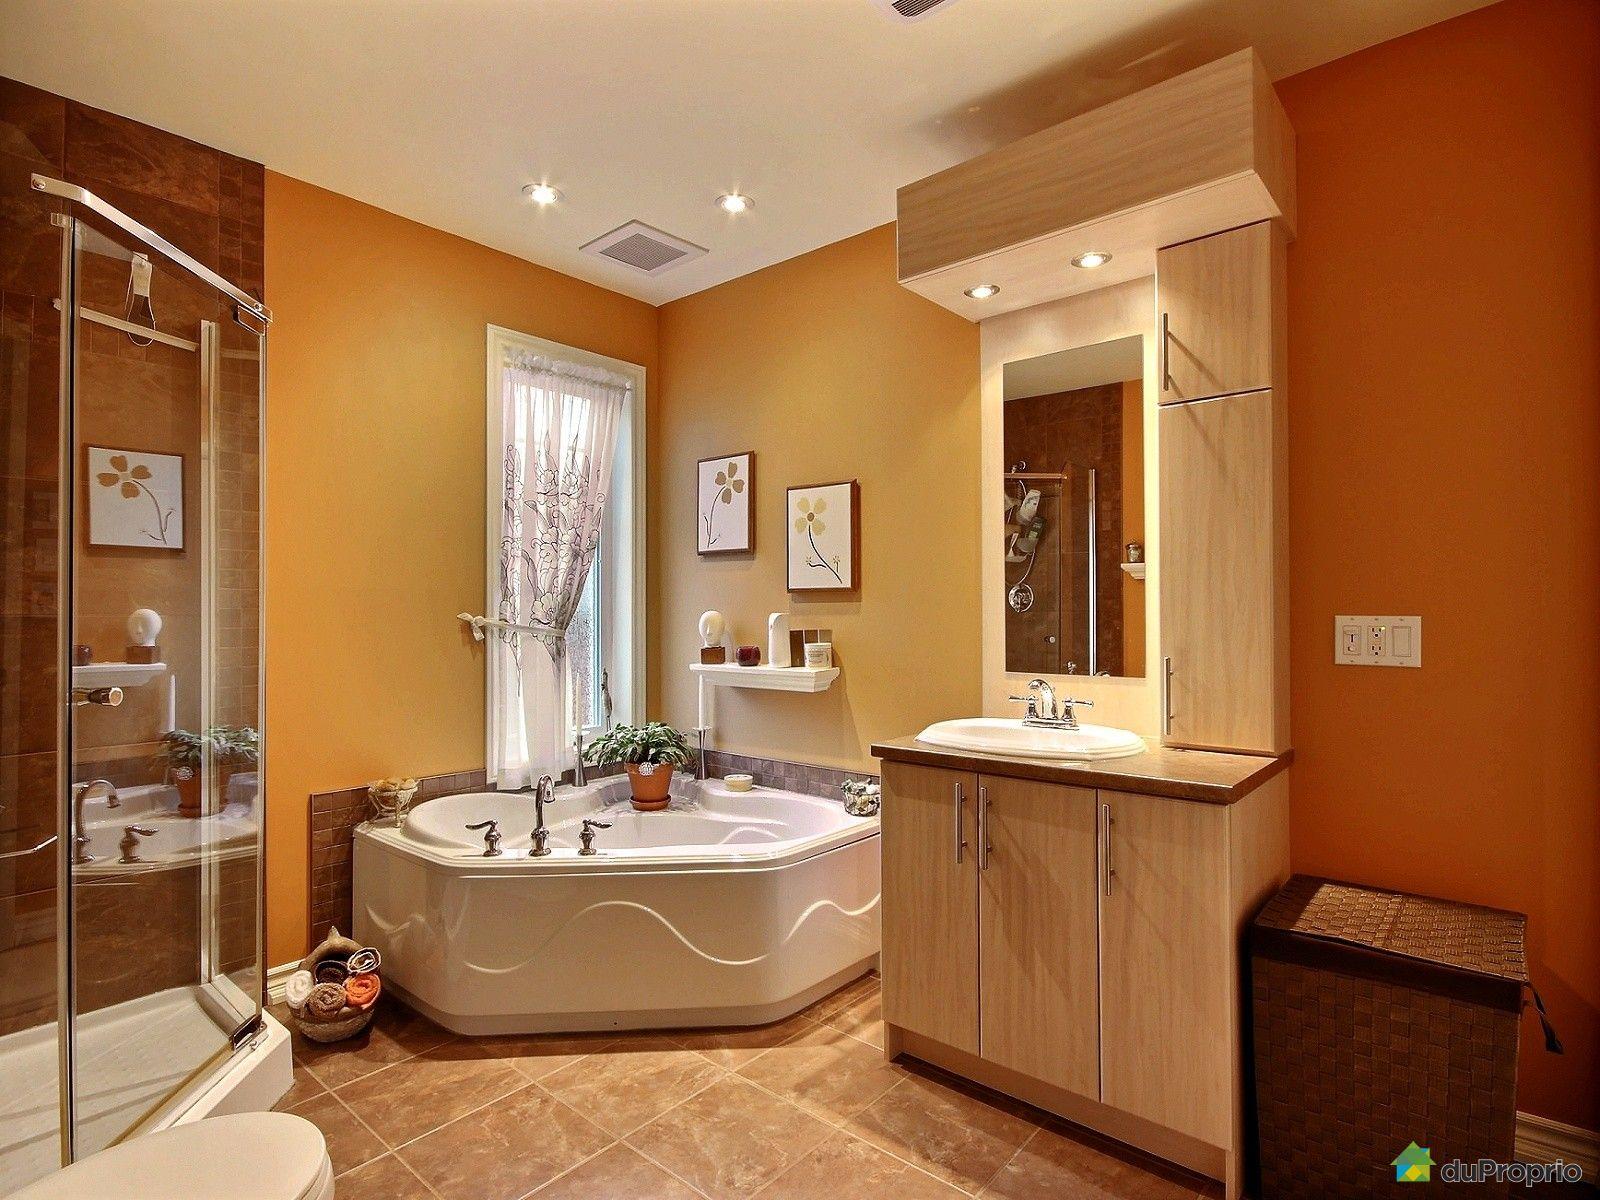 maison vendre rivi re rouge 226 impasse chaboillez immobilier qu bec duproprio 644724. Black Bedroom Furniture Sets. Home Design Ideas